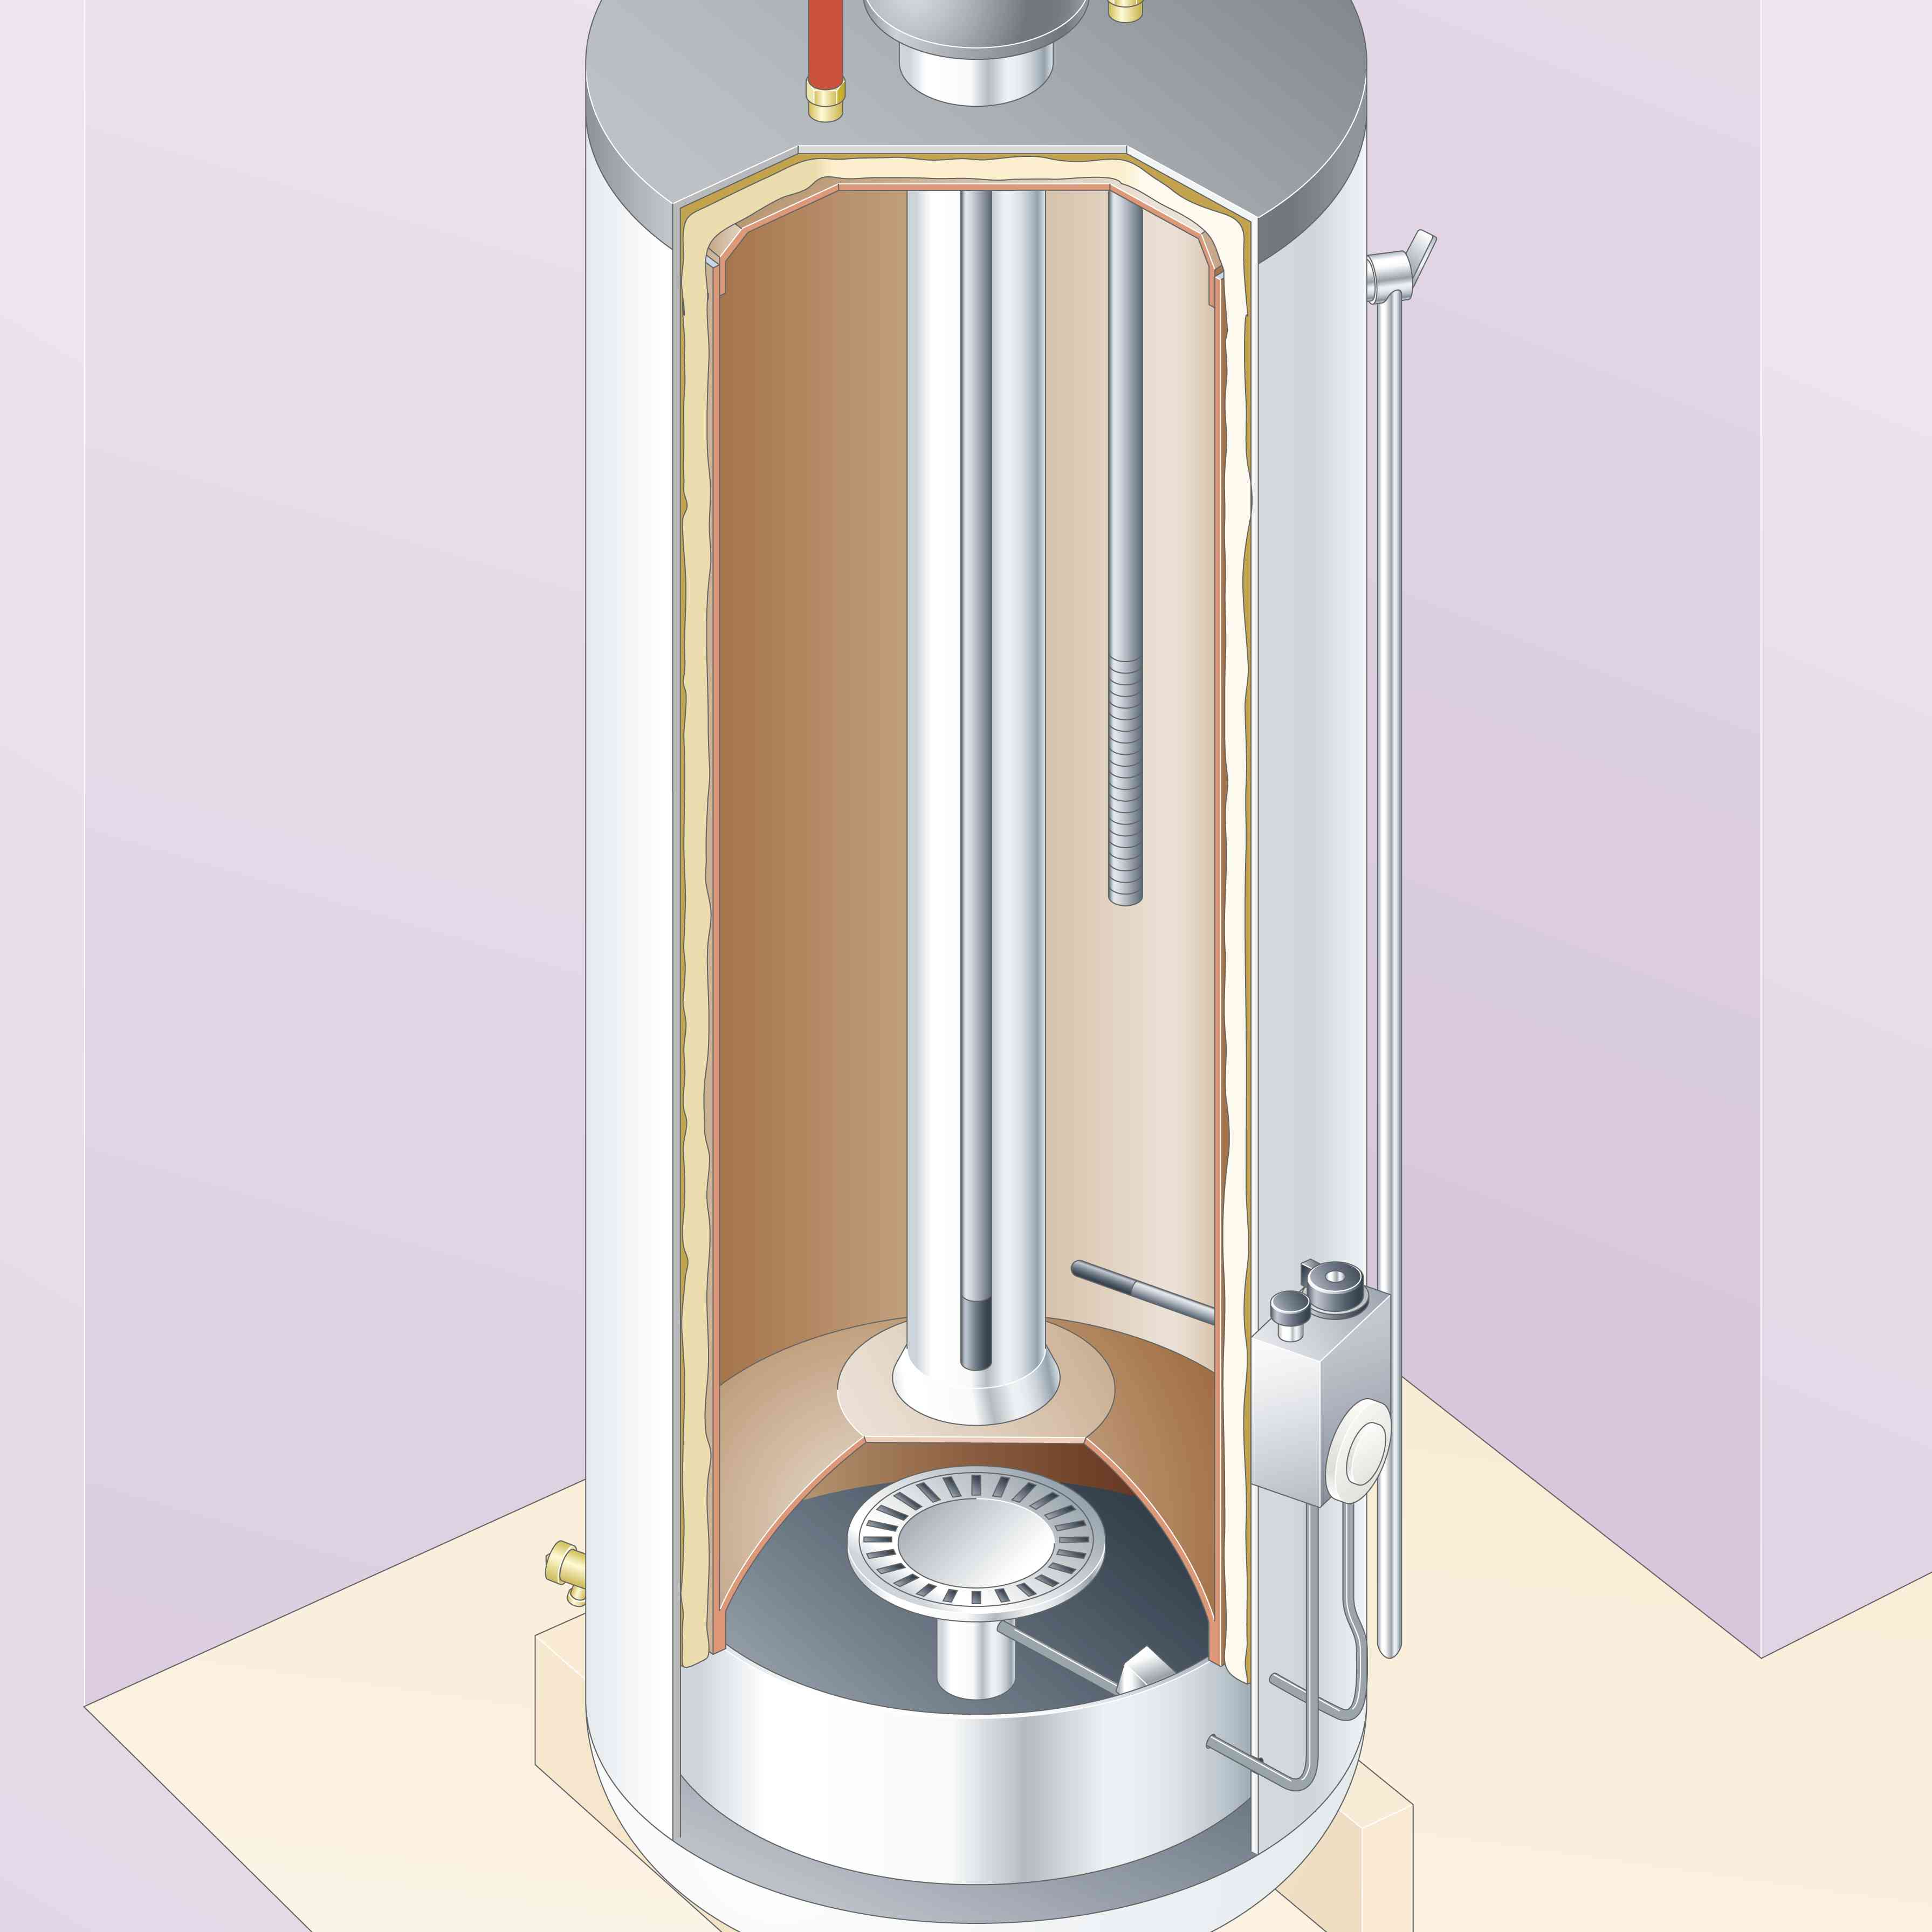 Digital illustration of inside of a gas water heater